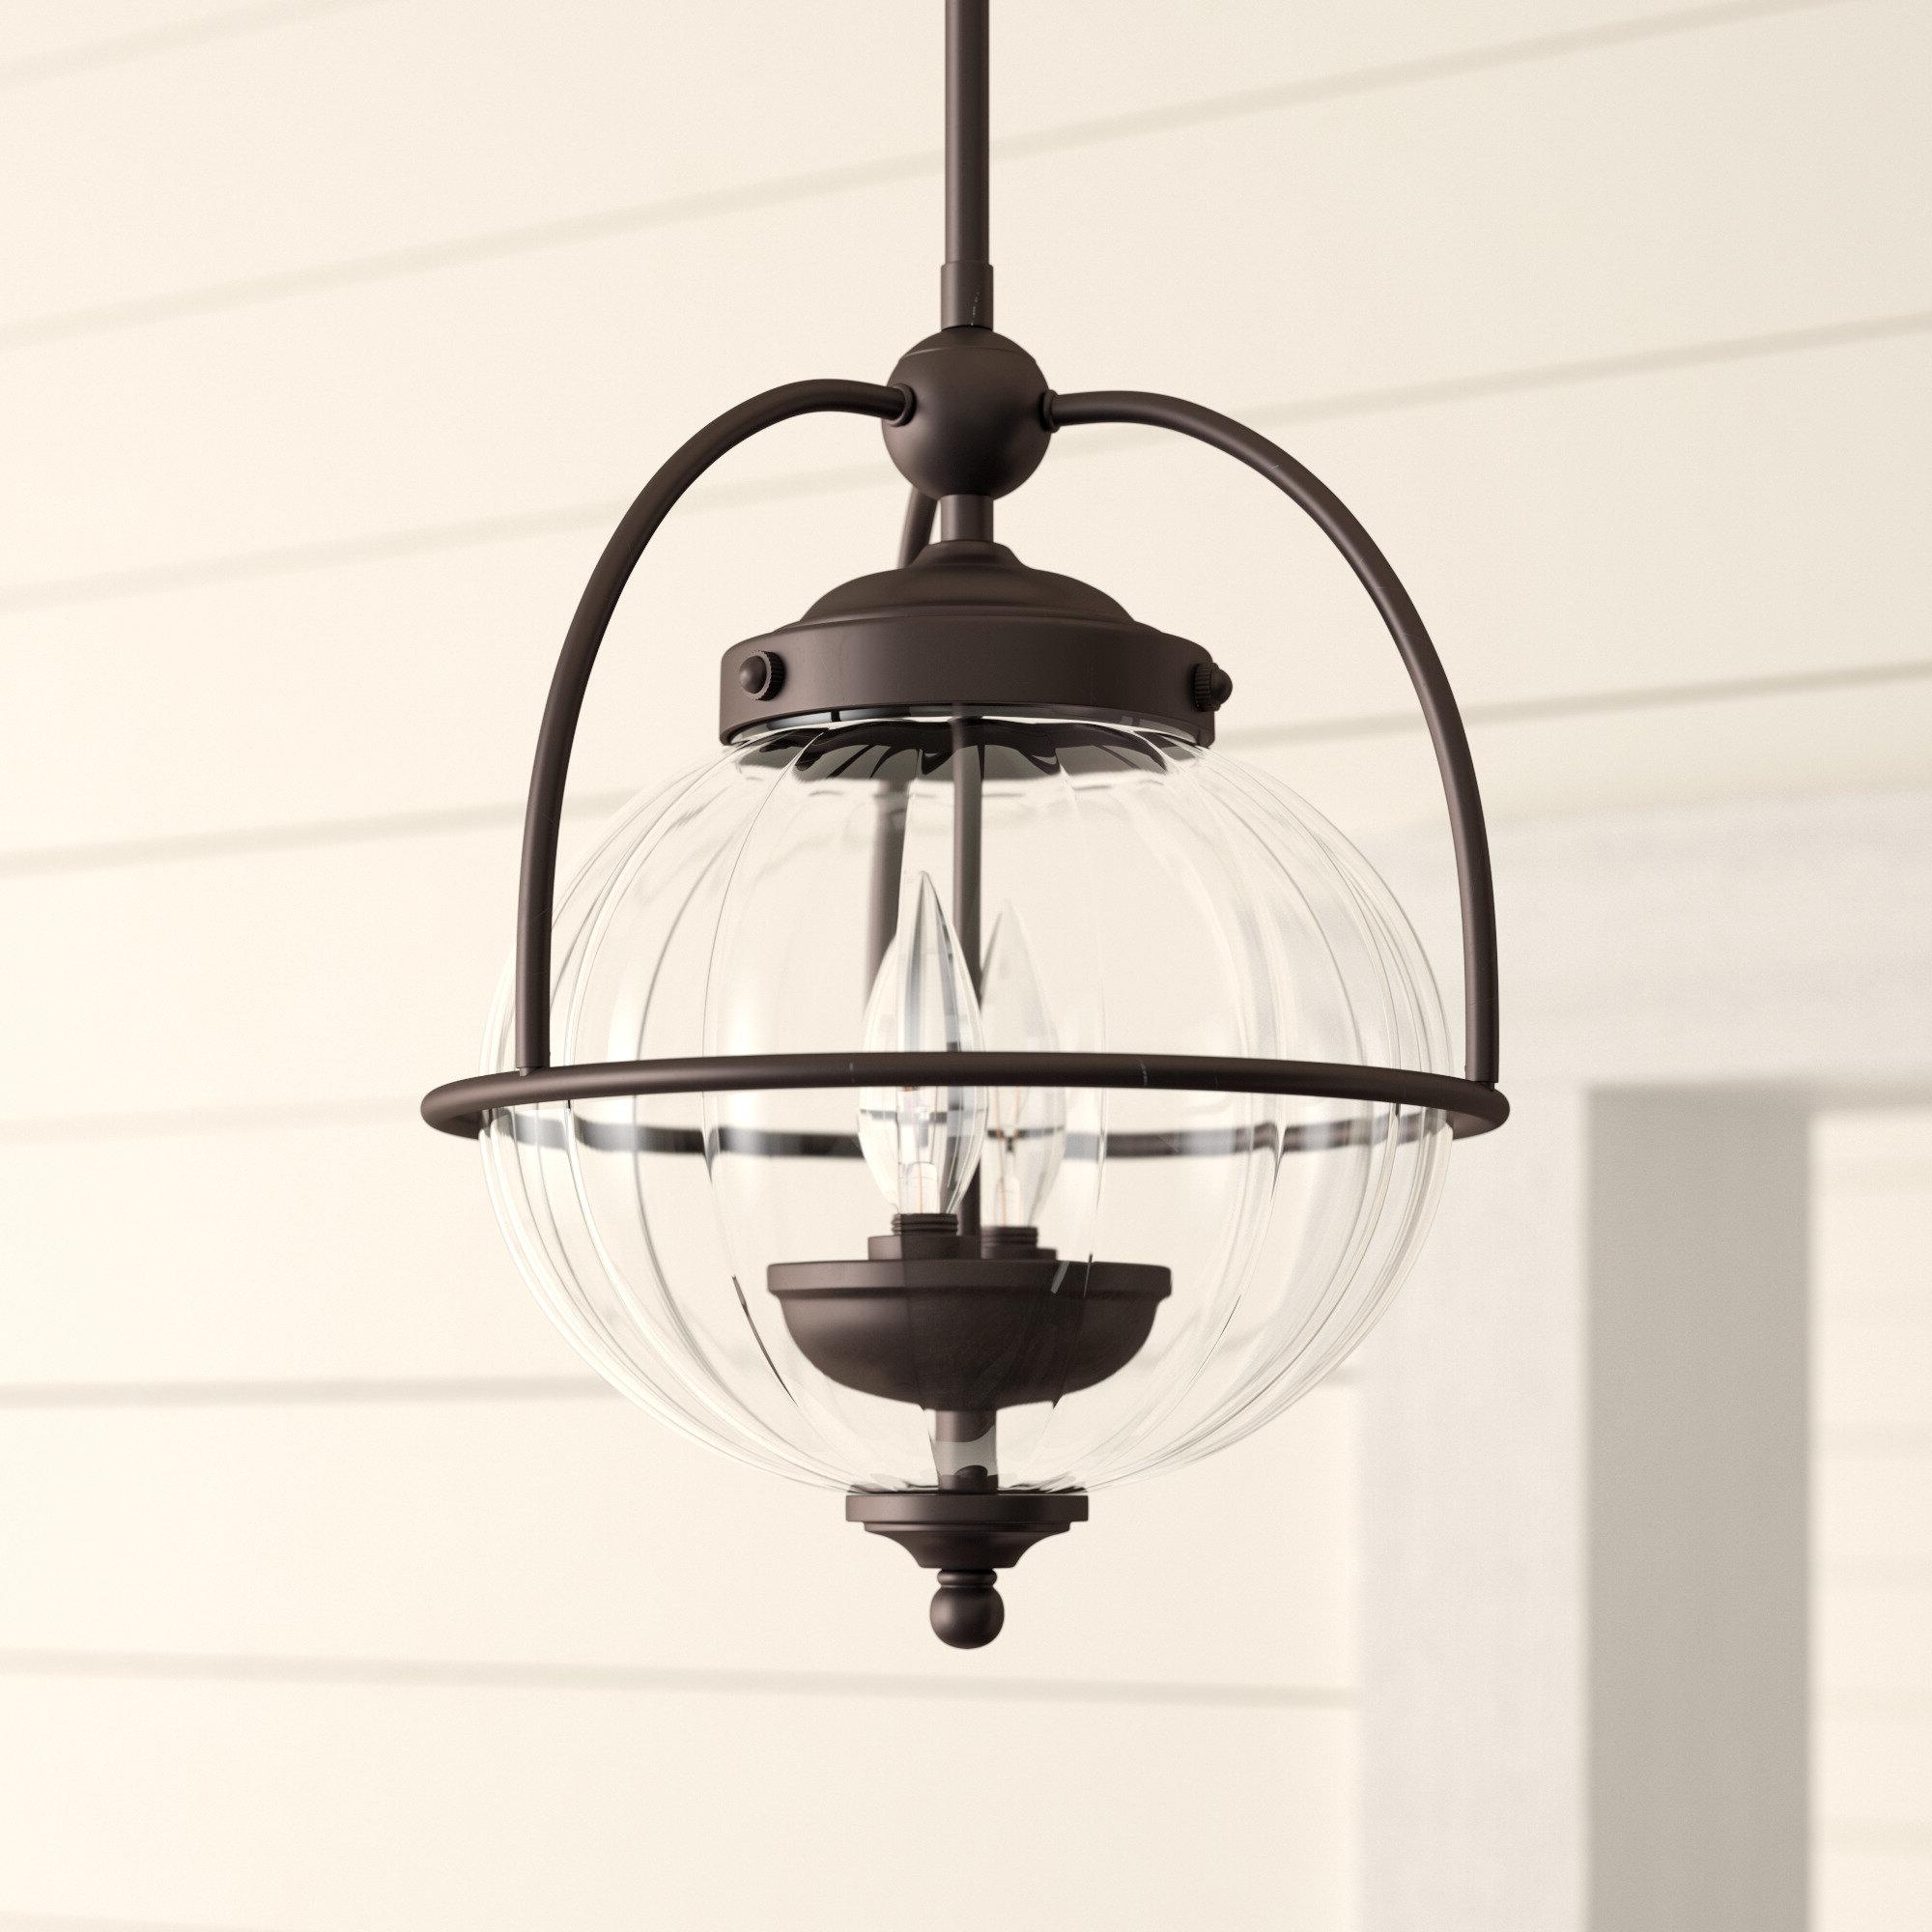 Most Popular Irwin 1 Light Single Globe Pendants Pertaining To Farmhouse & Rustic Globe Pendants (Gallery 14 of 20)